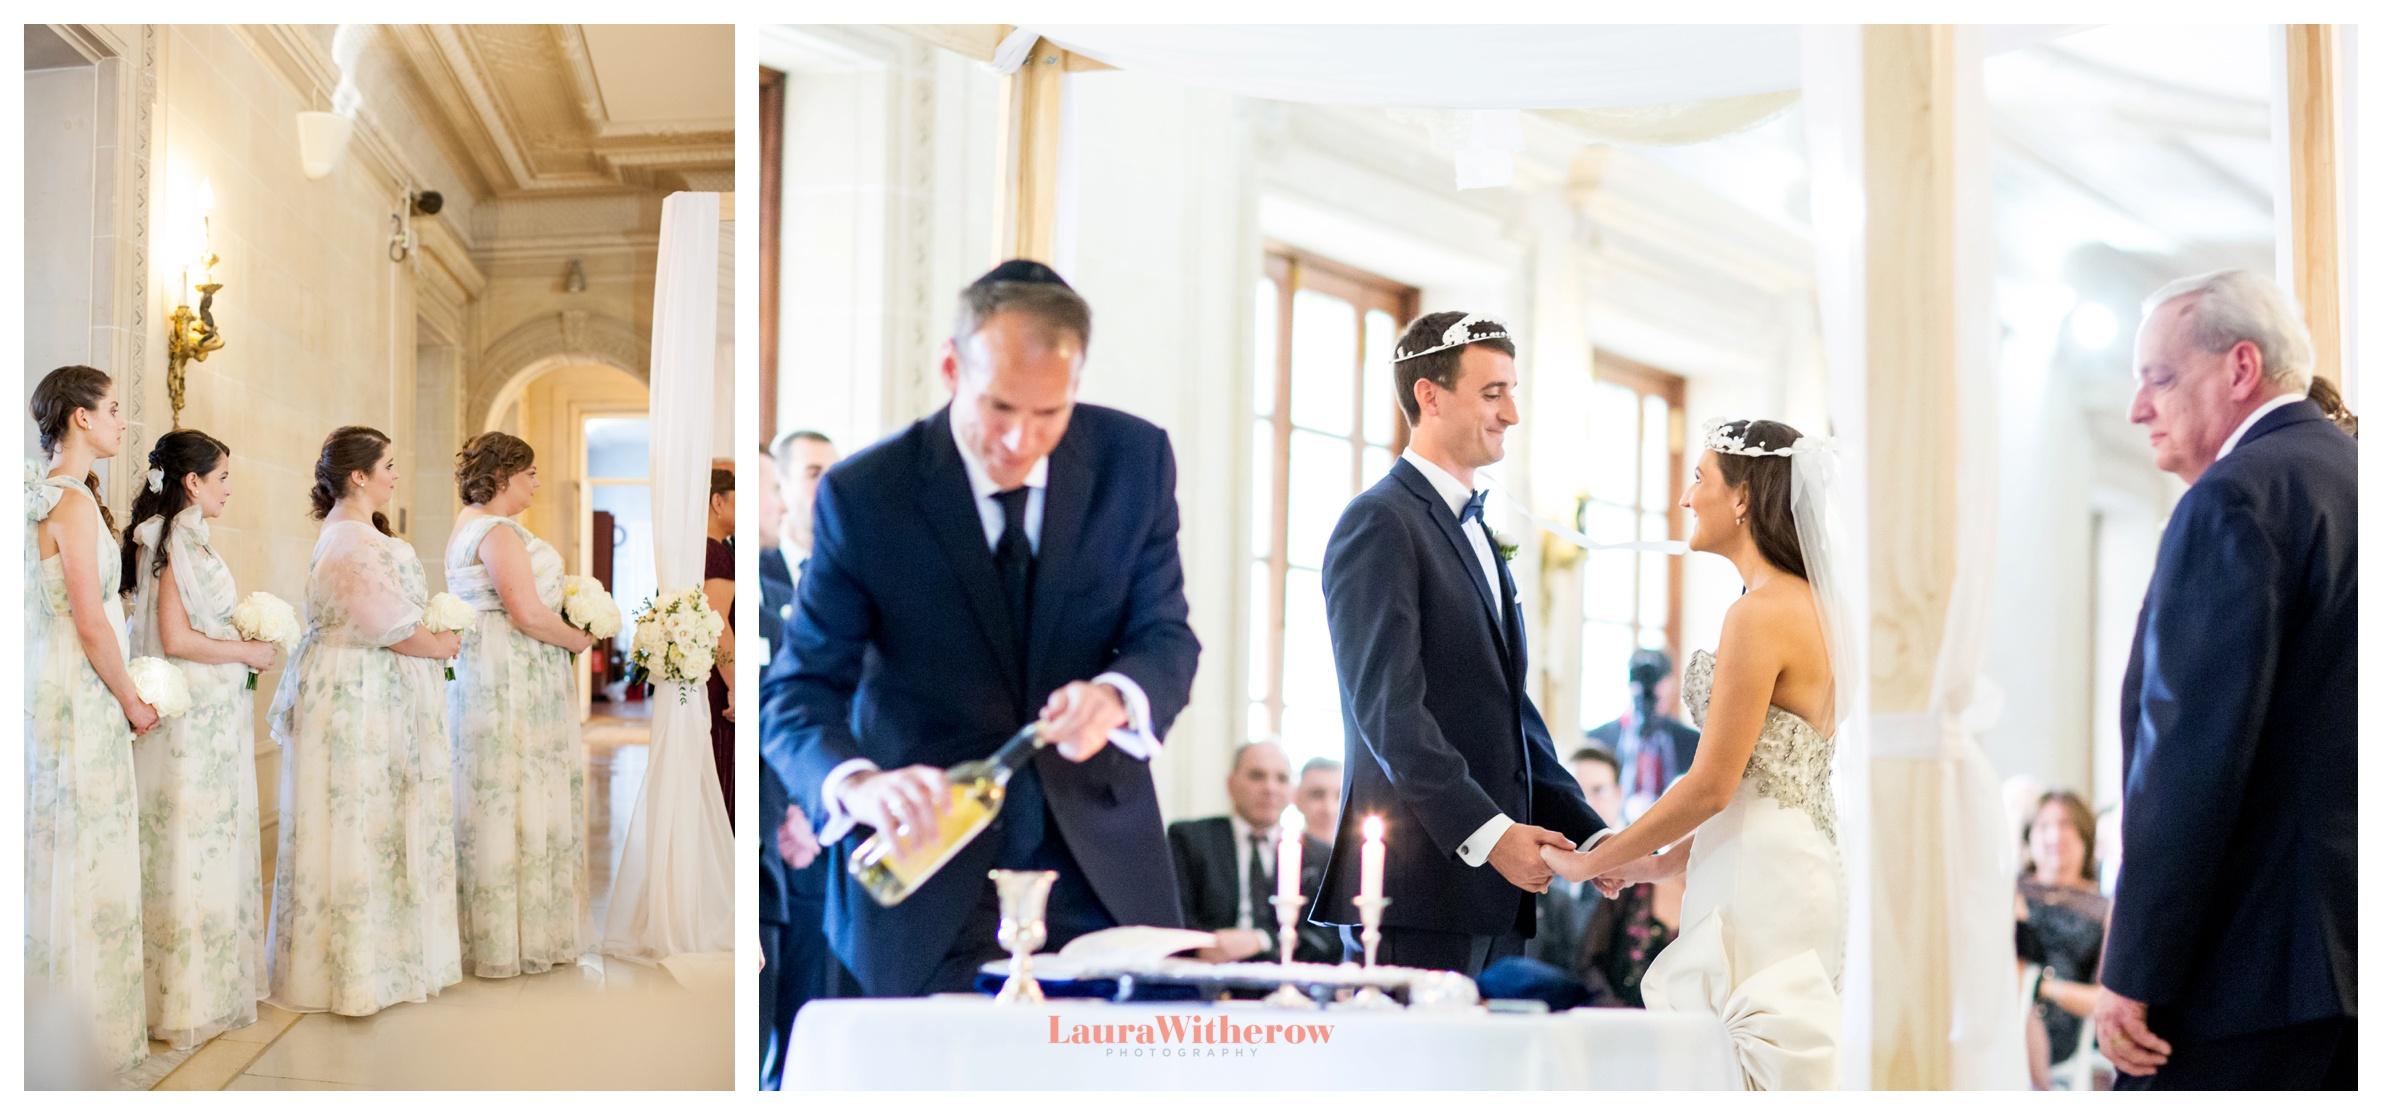 ceremony-armour-house-wedding